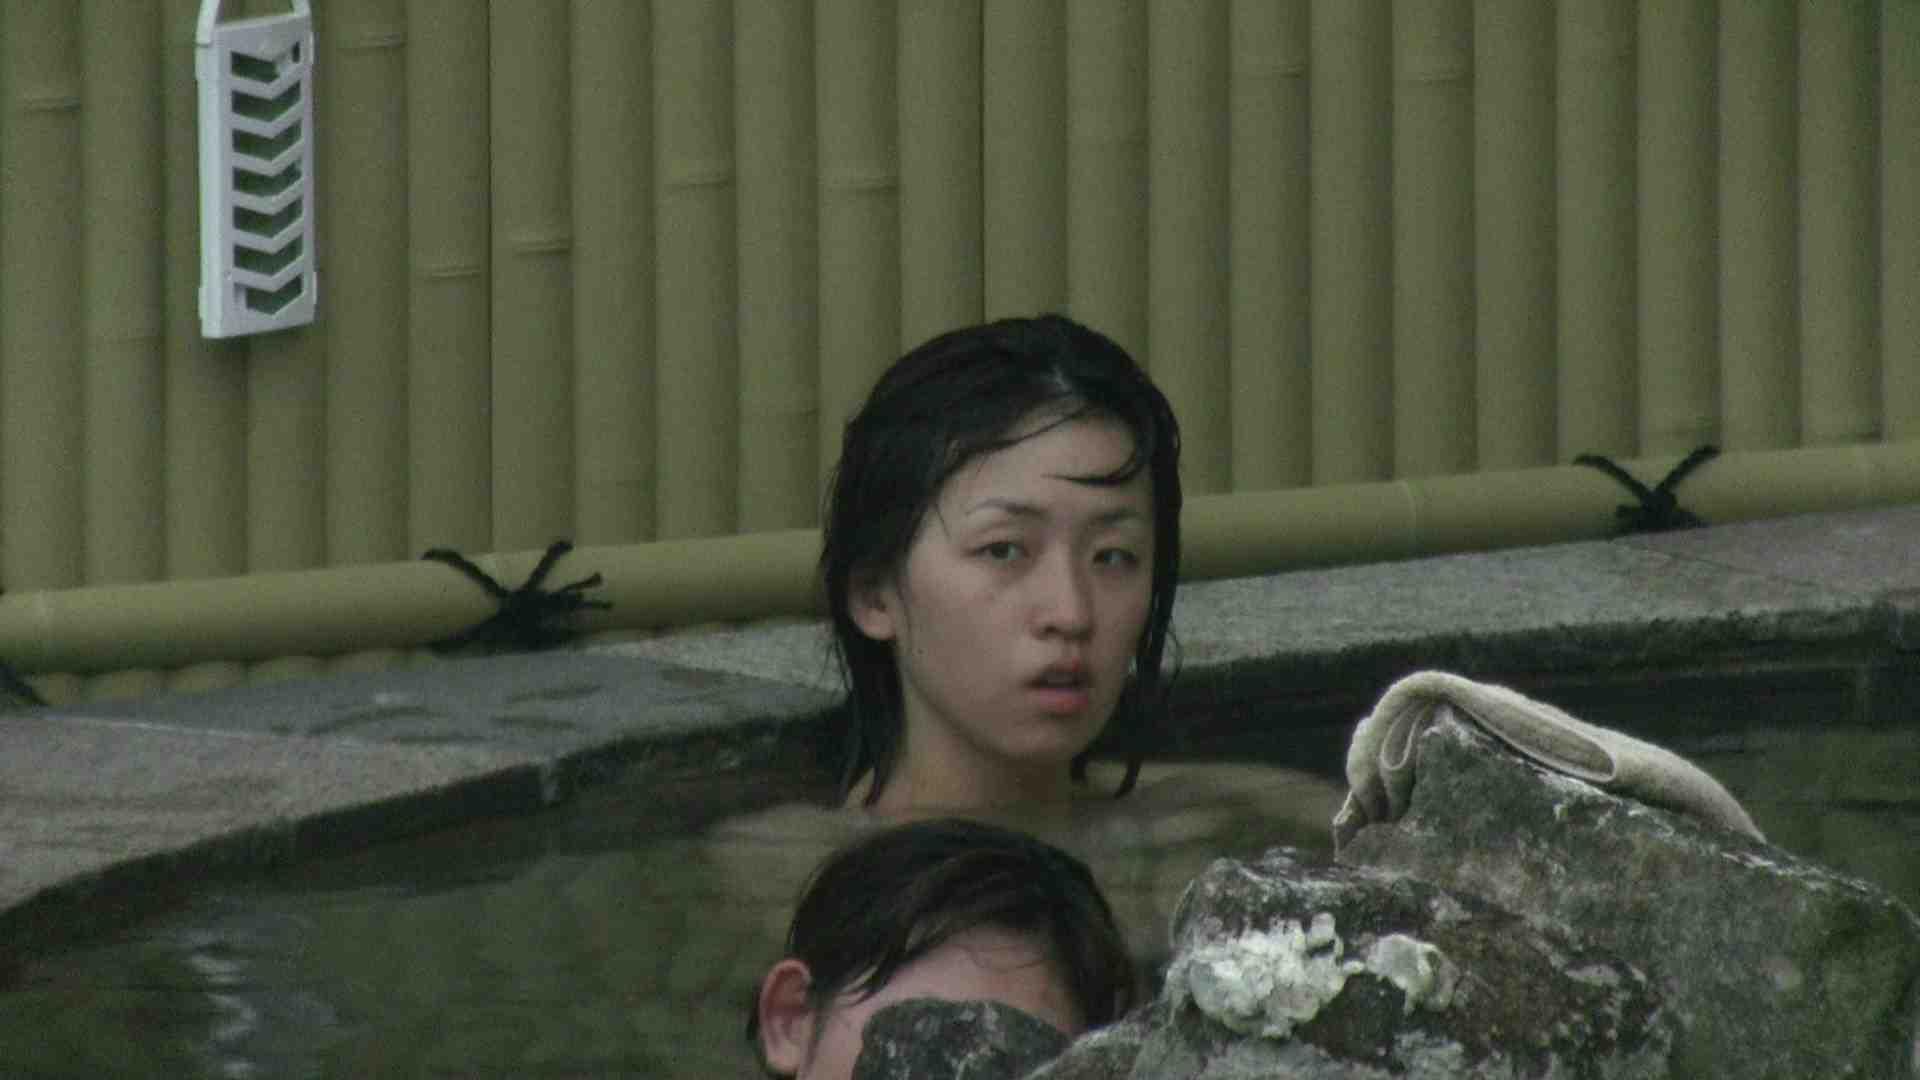 Aquaな露天風呂Vol.170 盗撮   OLセックス  54画像 13